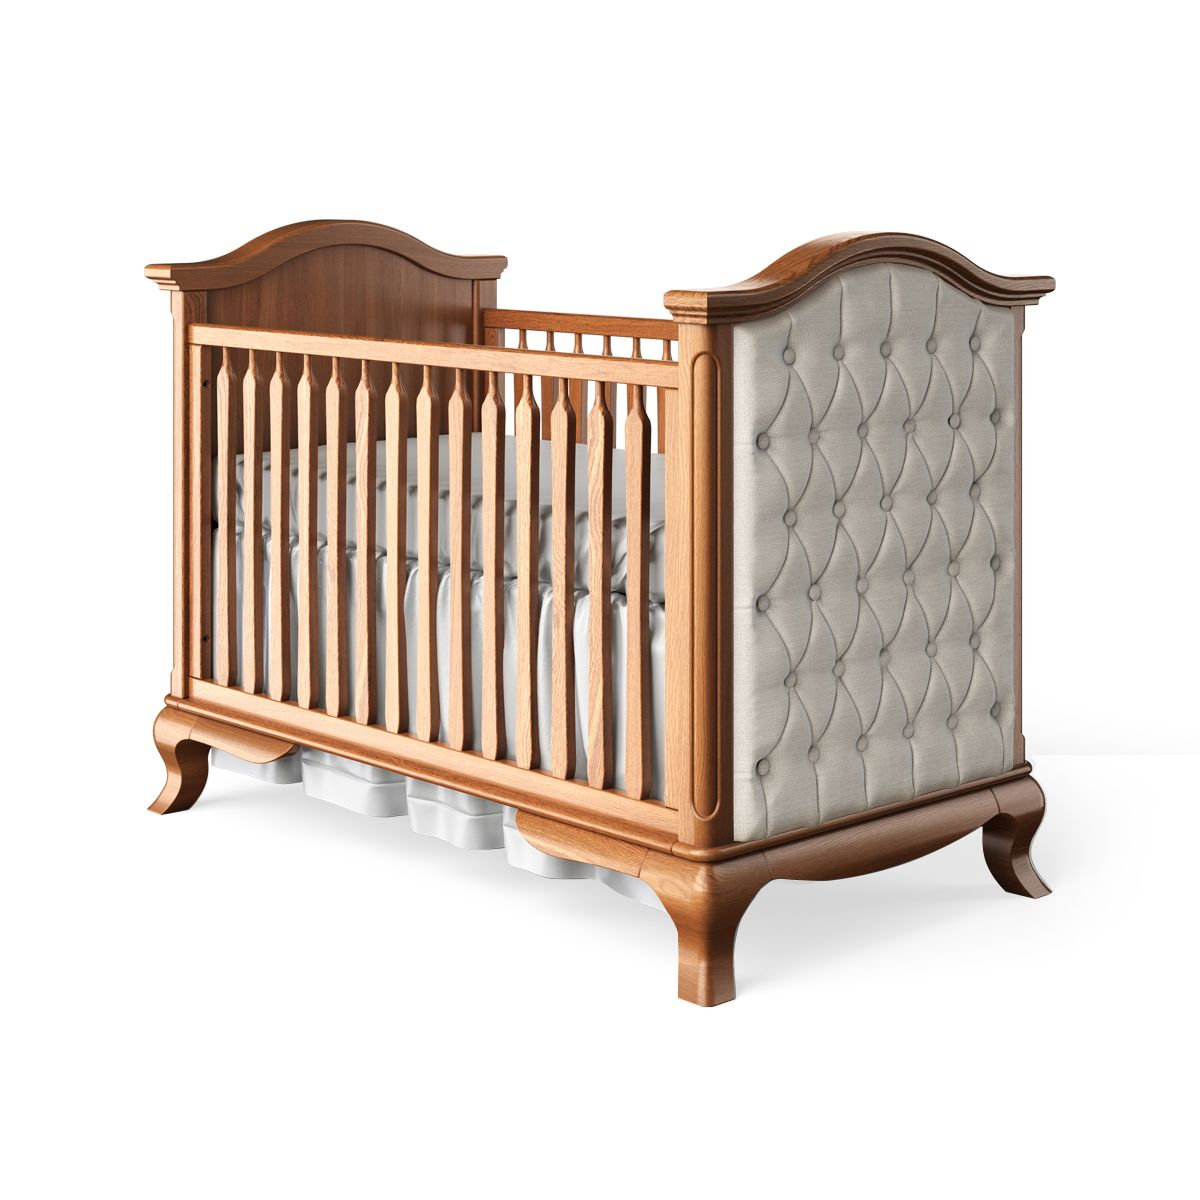 Cleopatra Classic Crib / Tufted Albero Puro / Standard